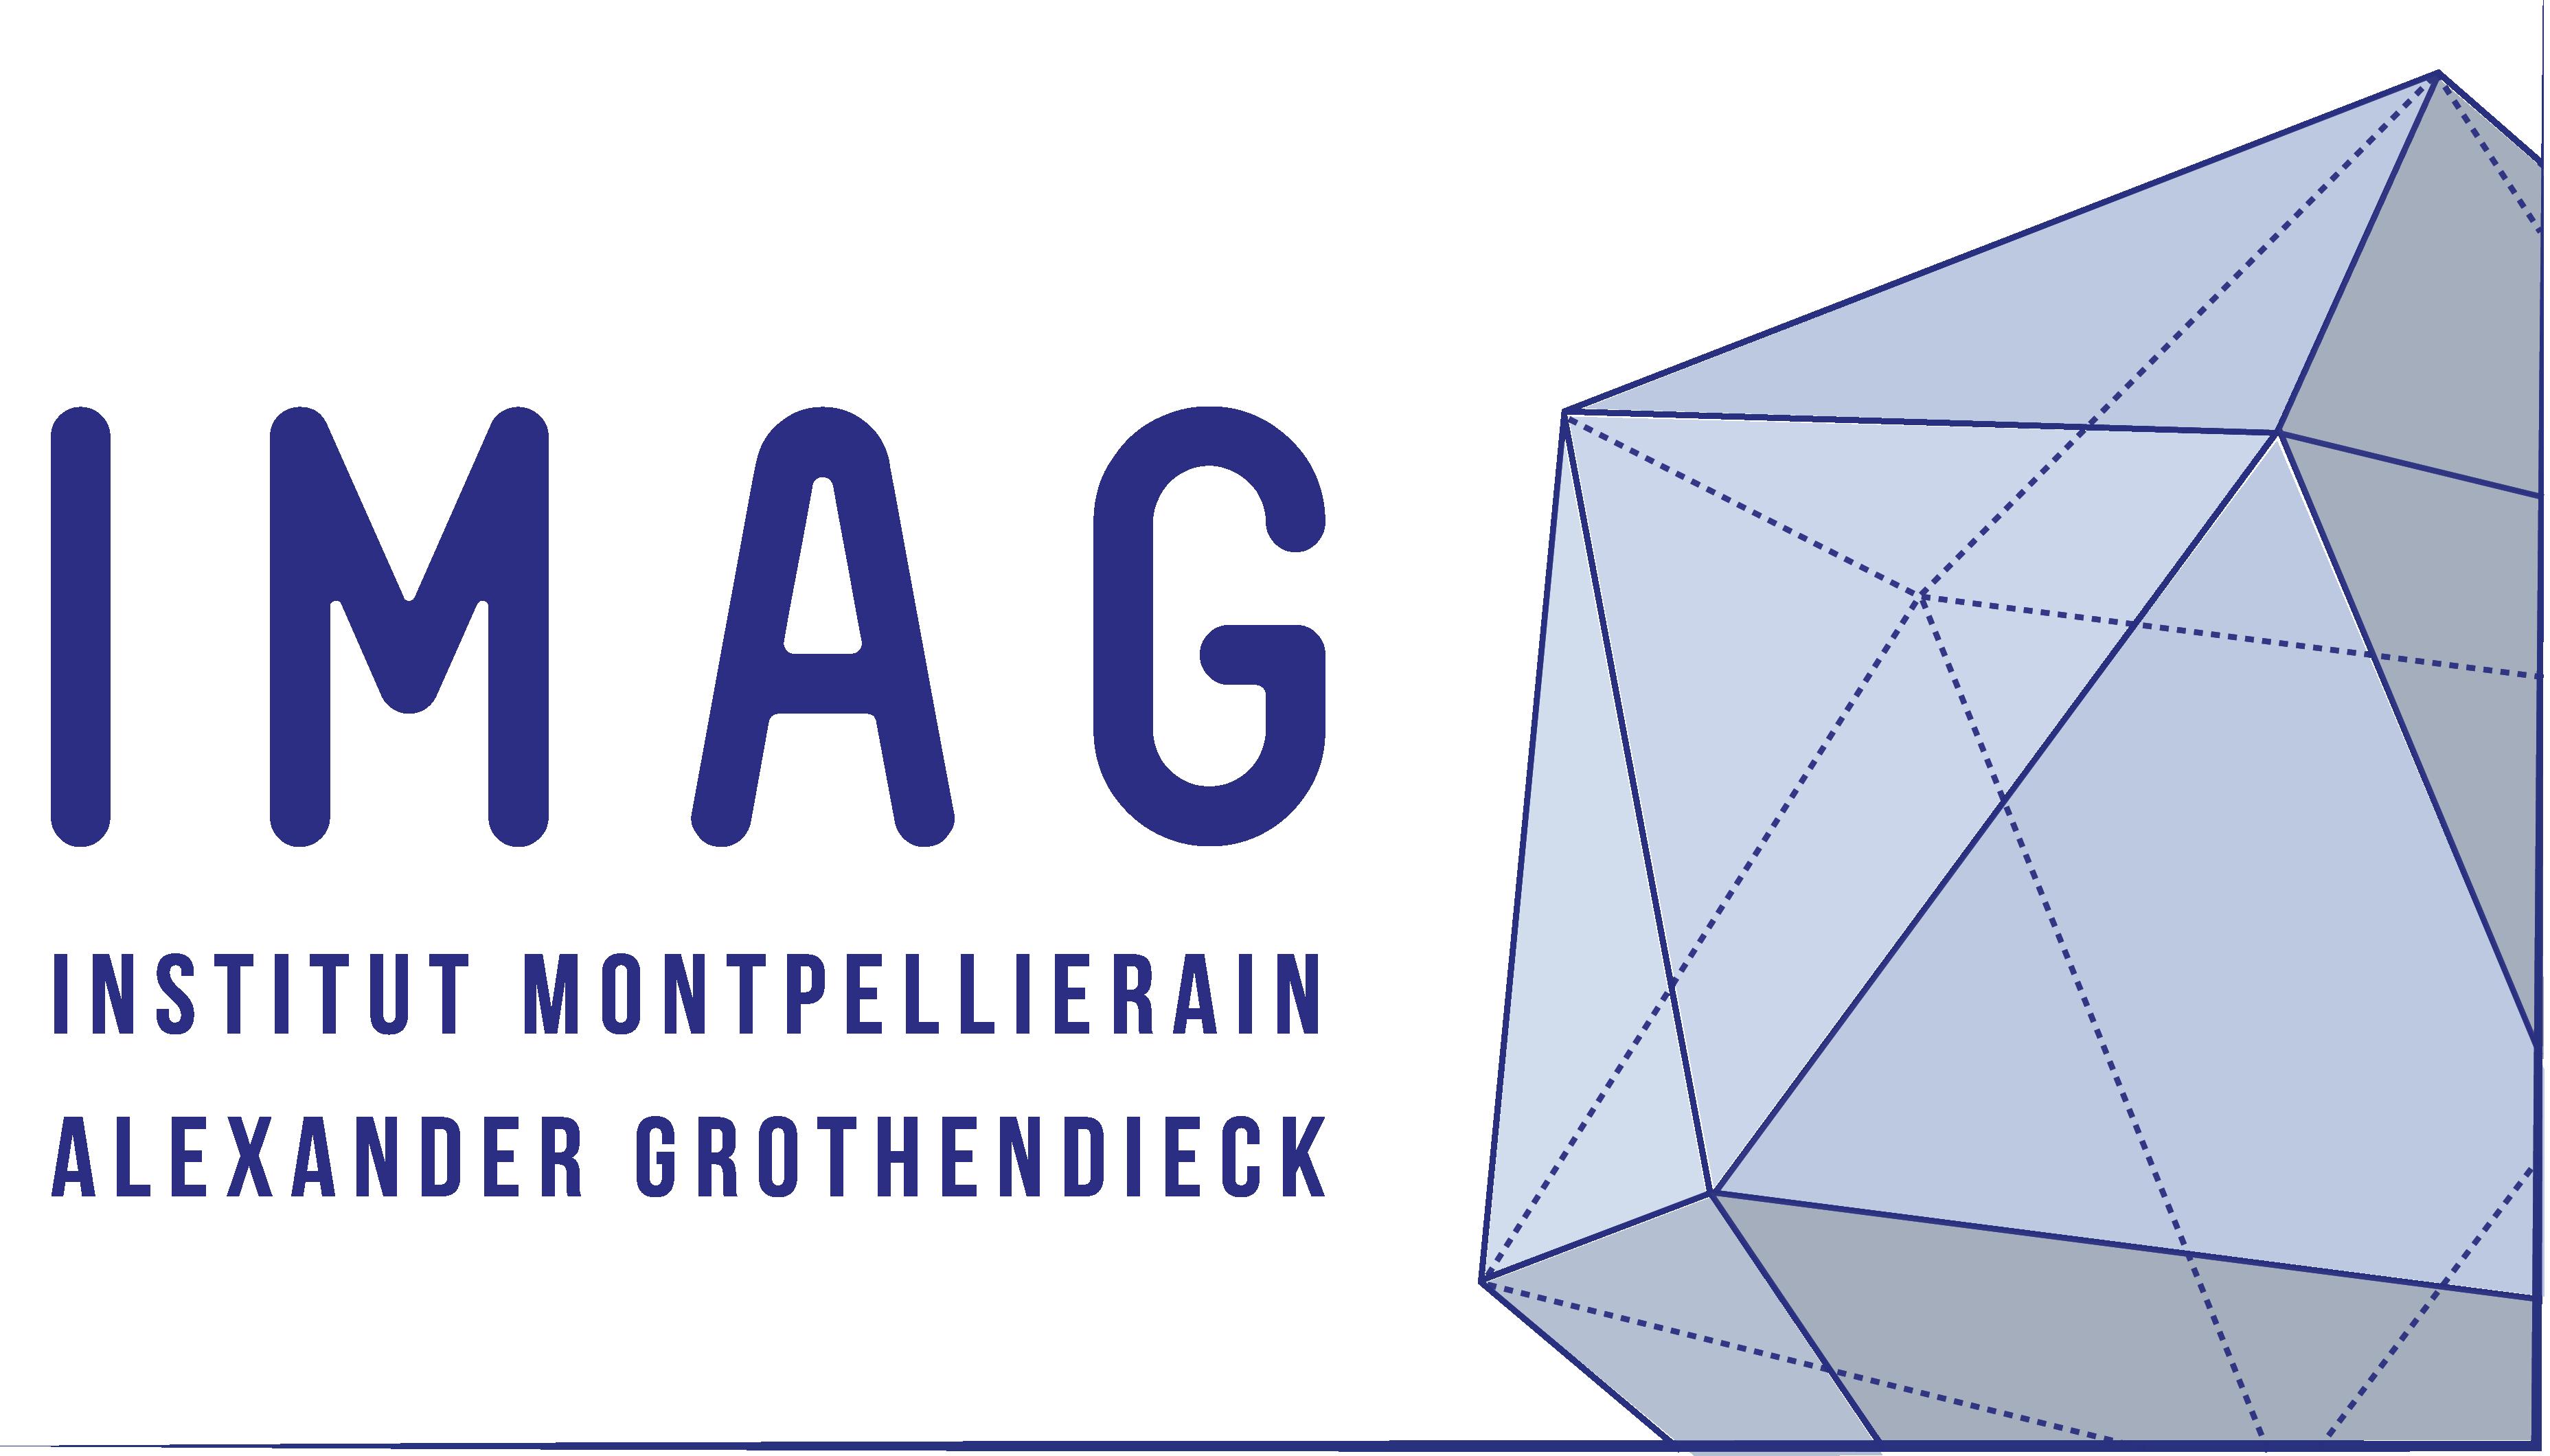 Institut Montpelliérain Alexander Grothendieck (IMAG)